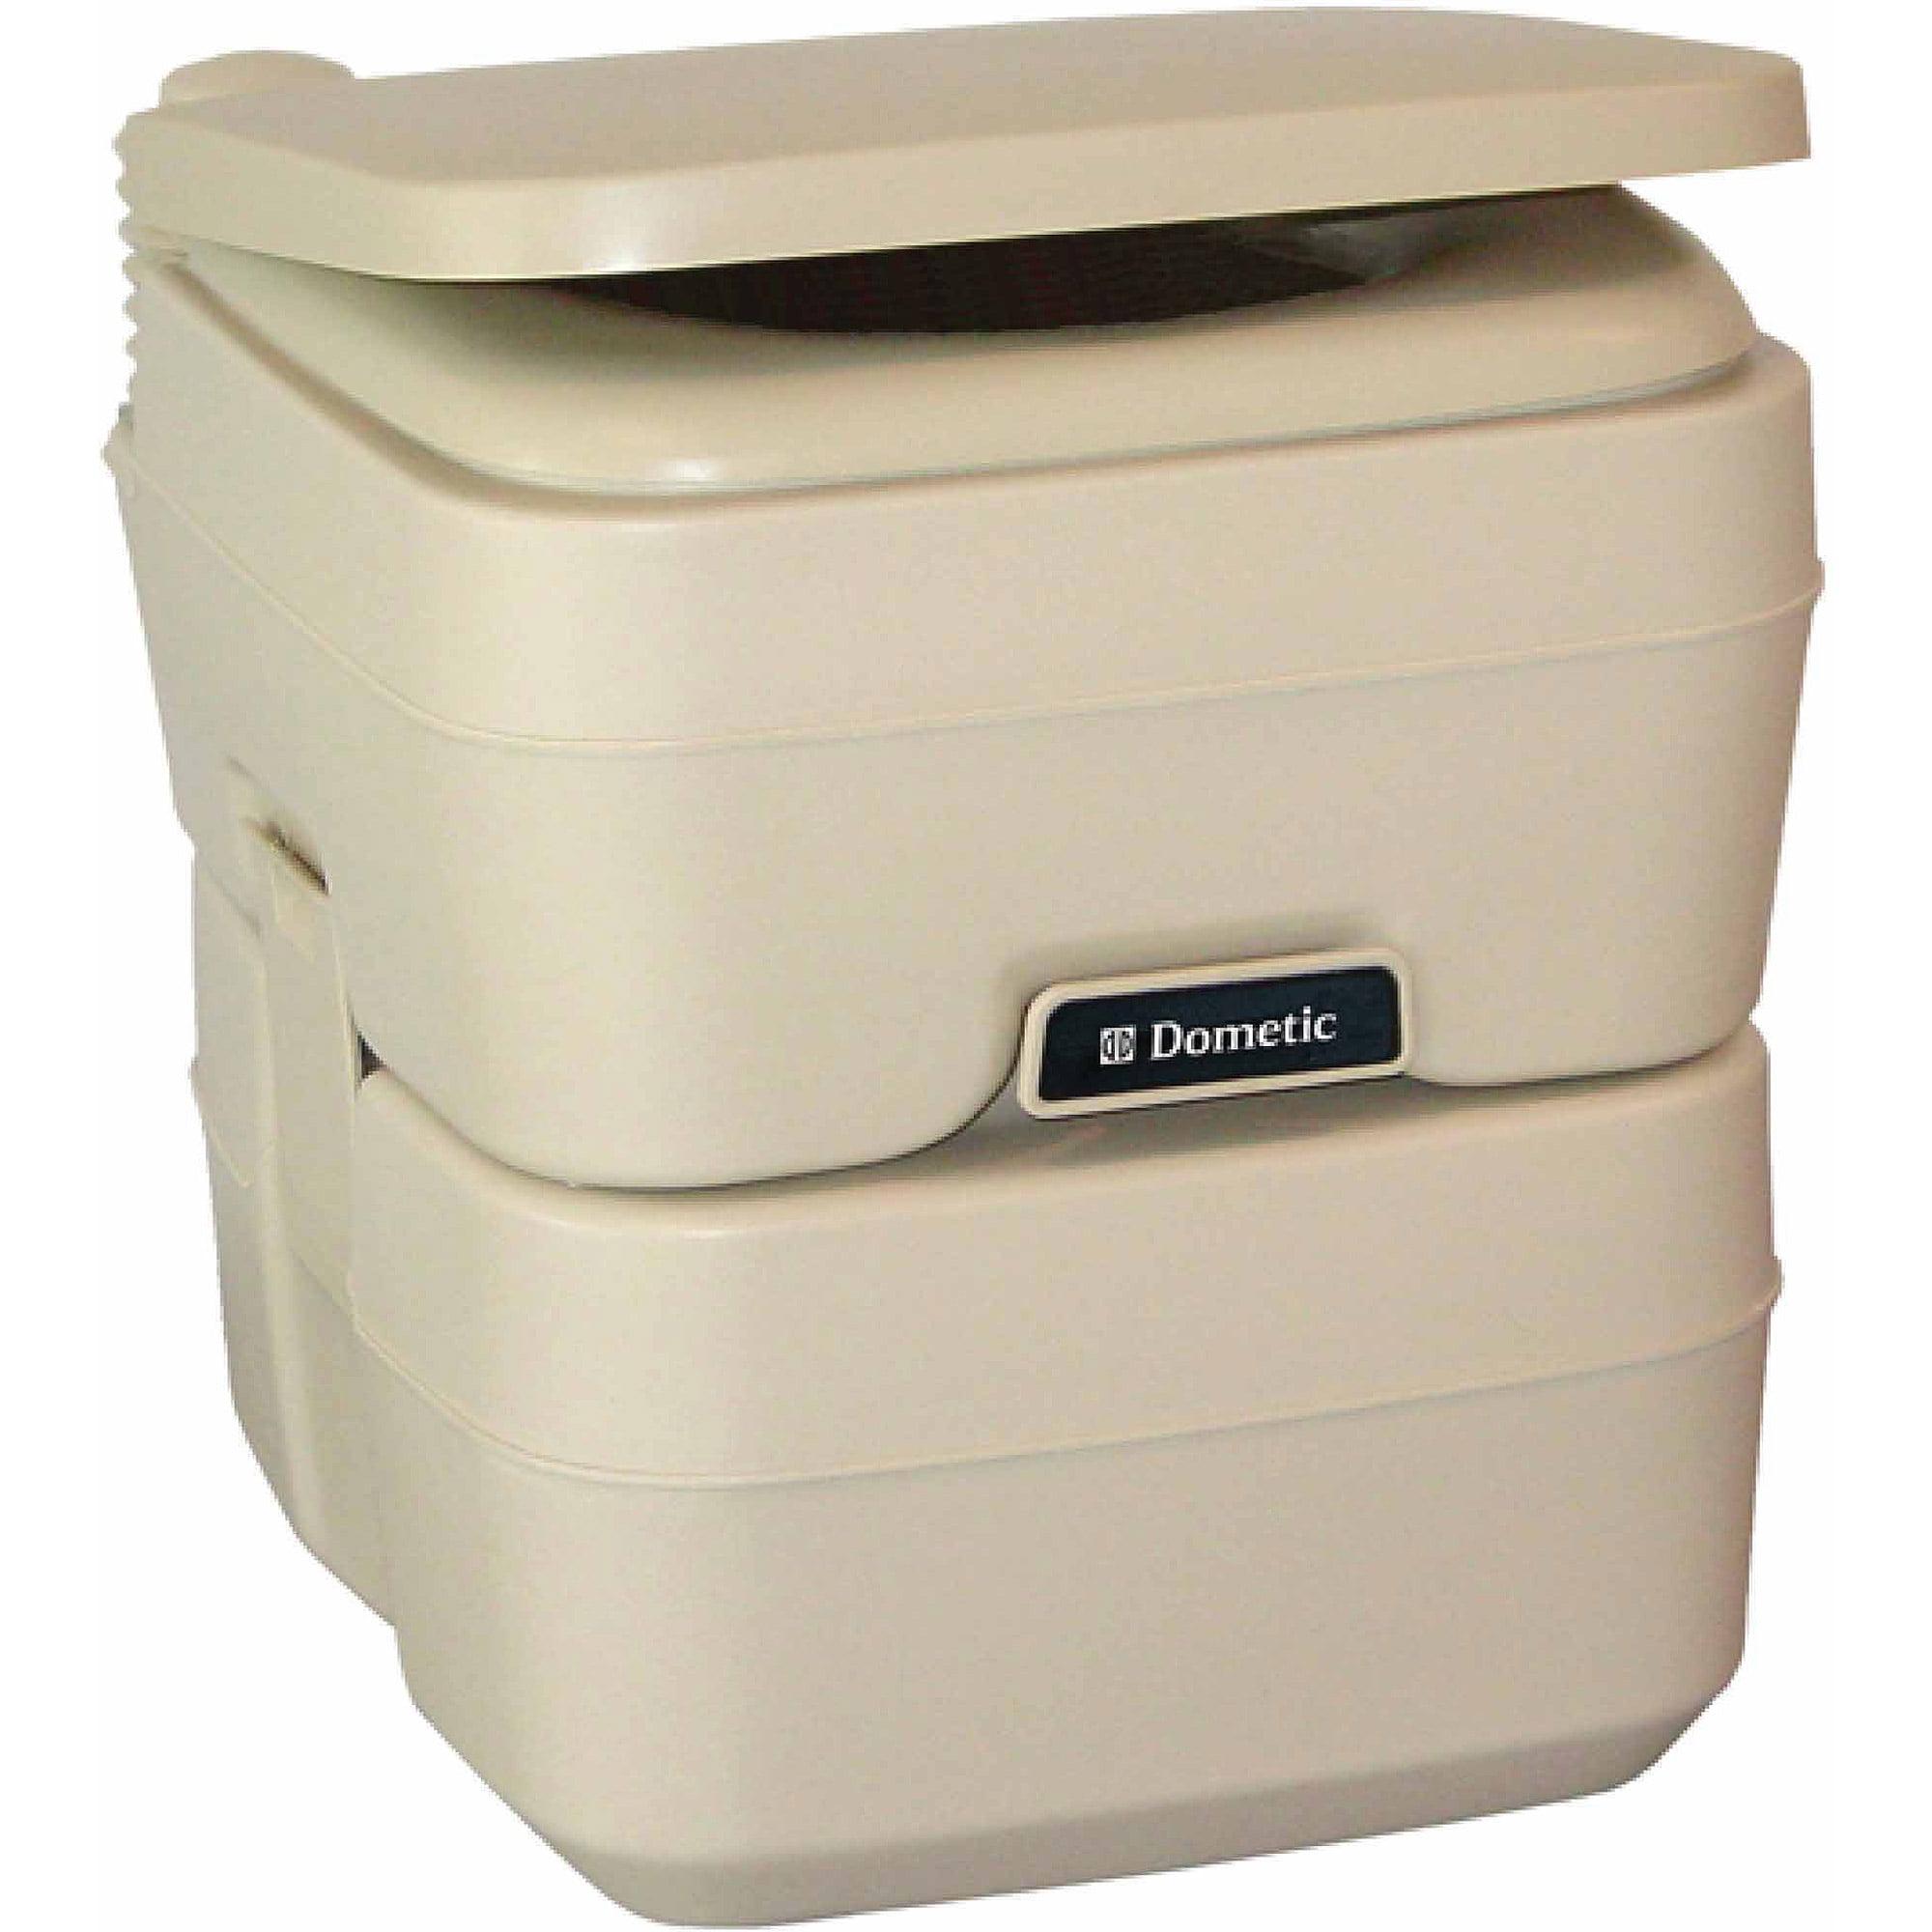 SeaLand 5.0 Gallon SaniPottie 965 Portable Toilet with Mounting Brackets